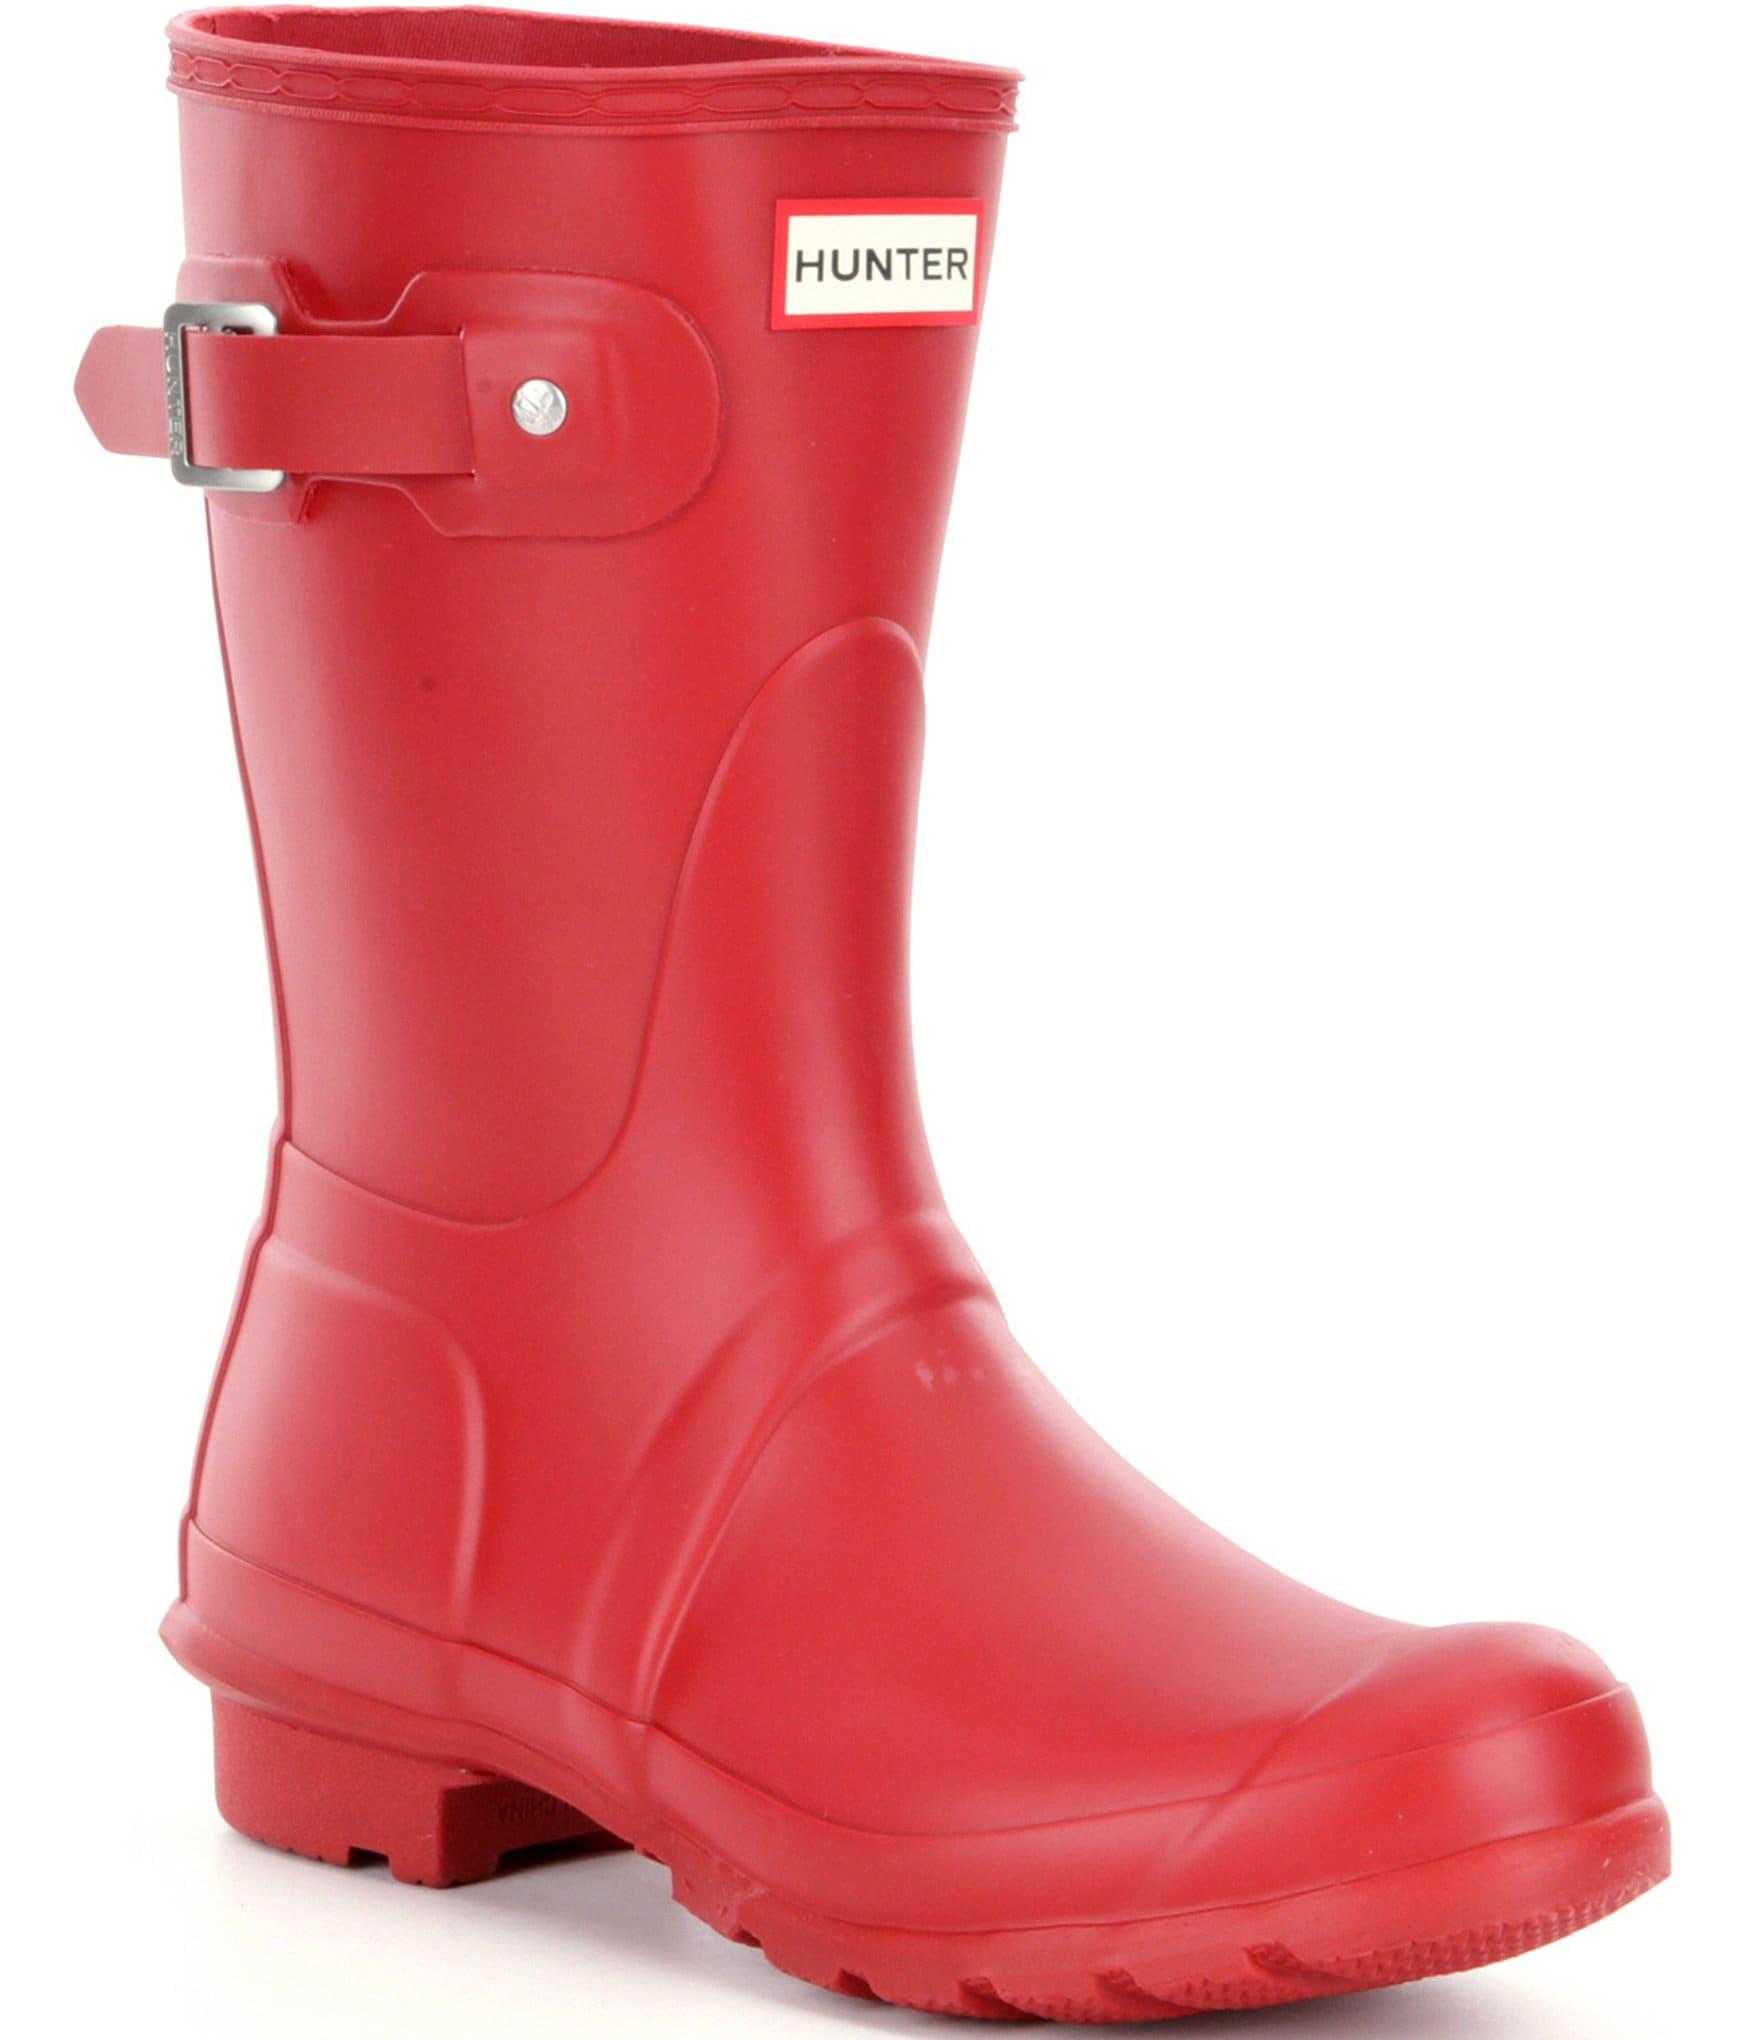 cd92c1dc6 Hunter Women s Rain Boots